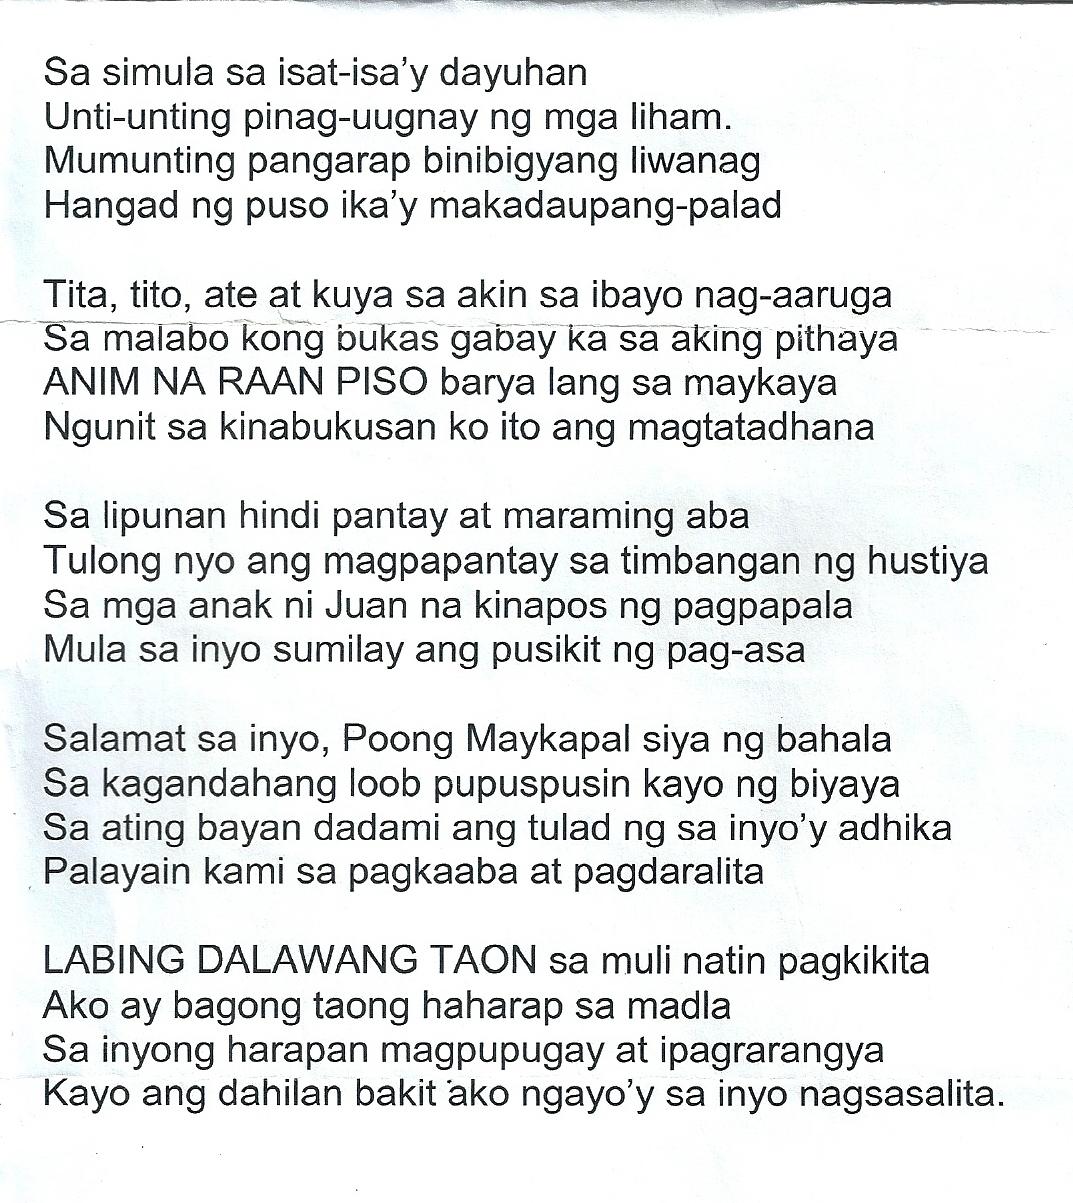 Tagalog version of first inspiration poem